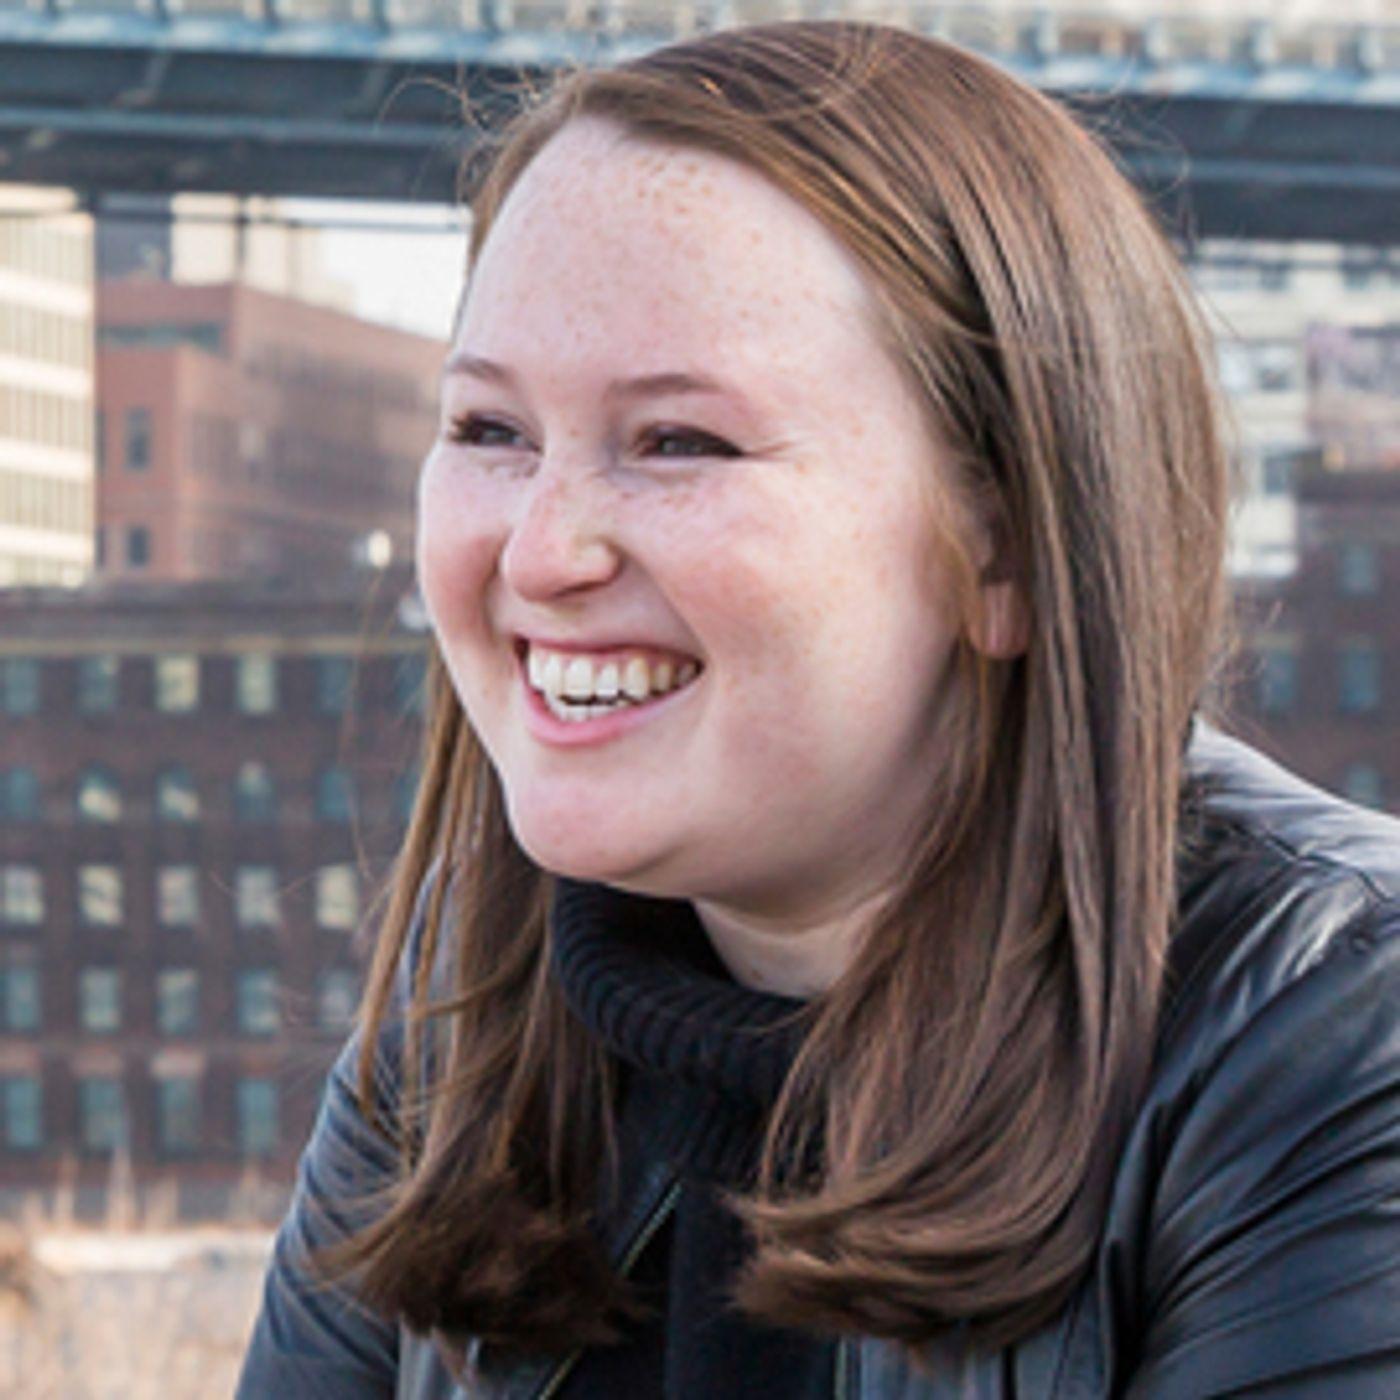 Sophie Beren: How to Build Better Communities Through Better Conversations